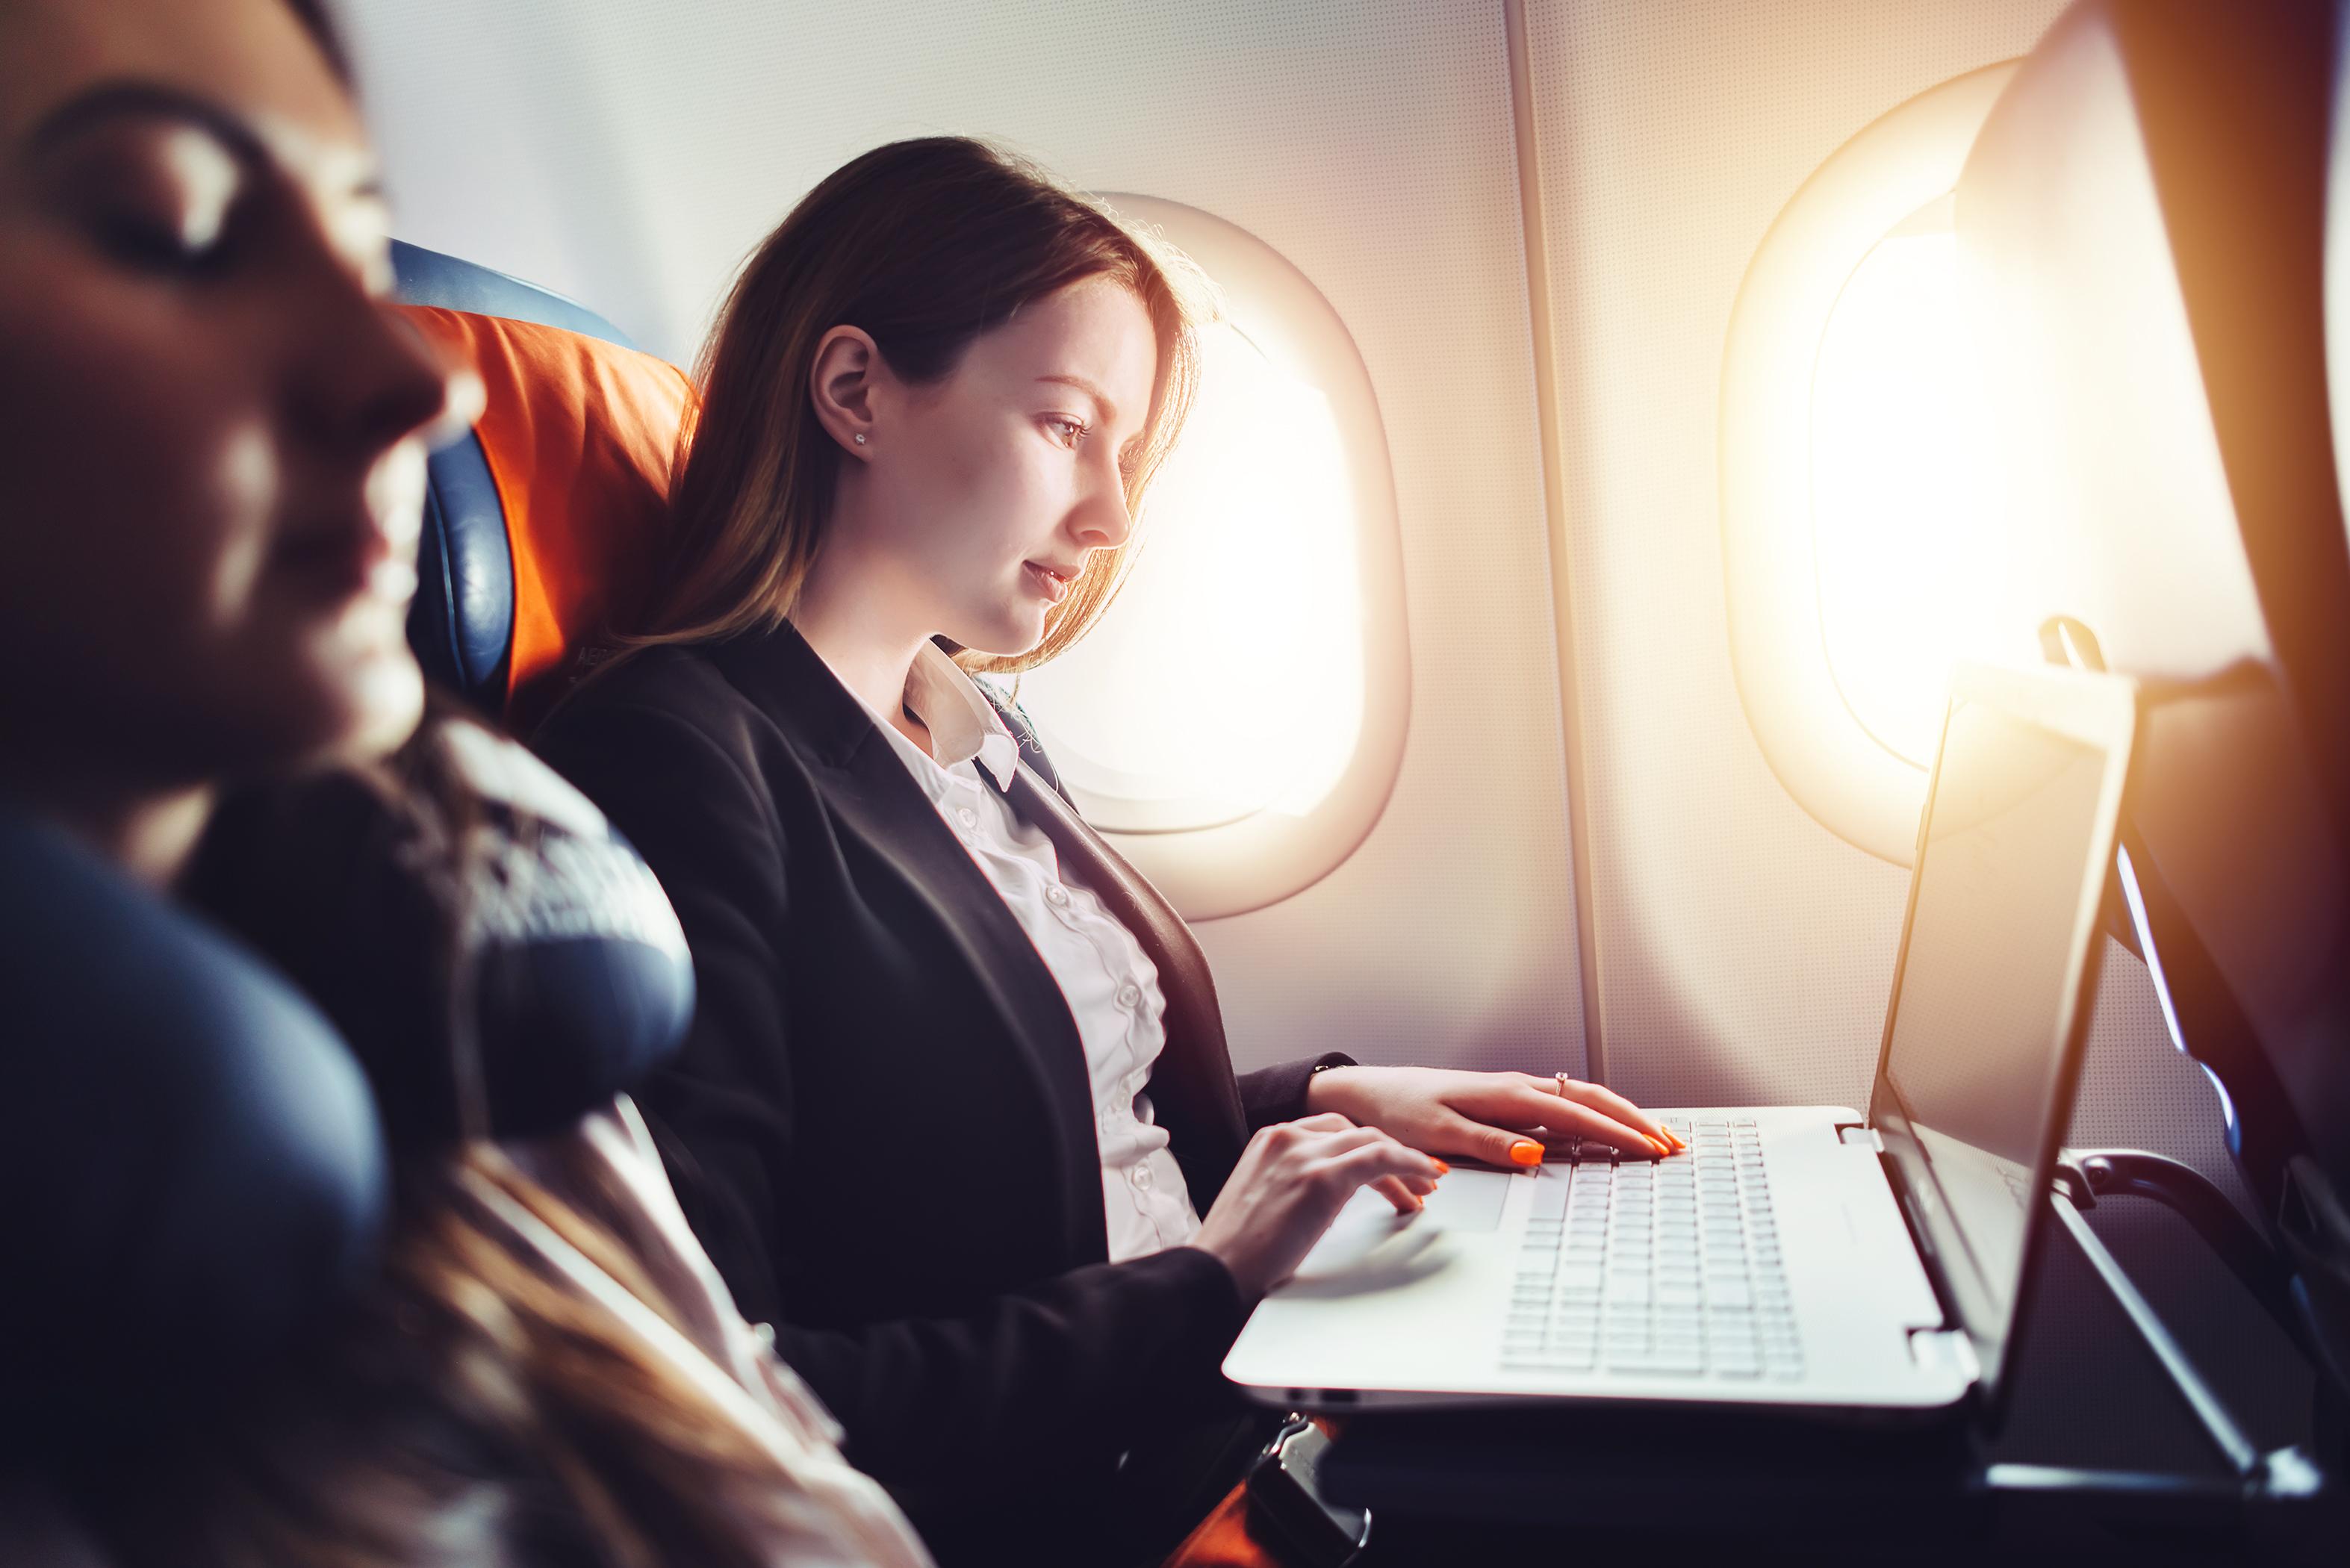 A woman using a laptop on a plane.